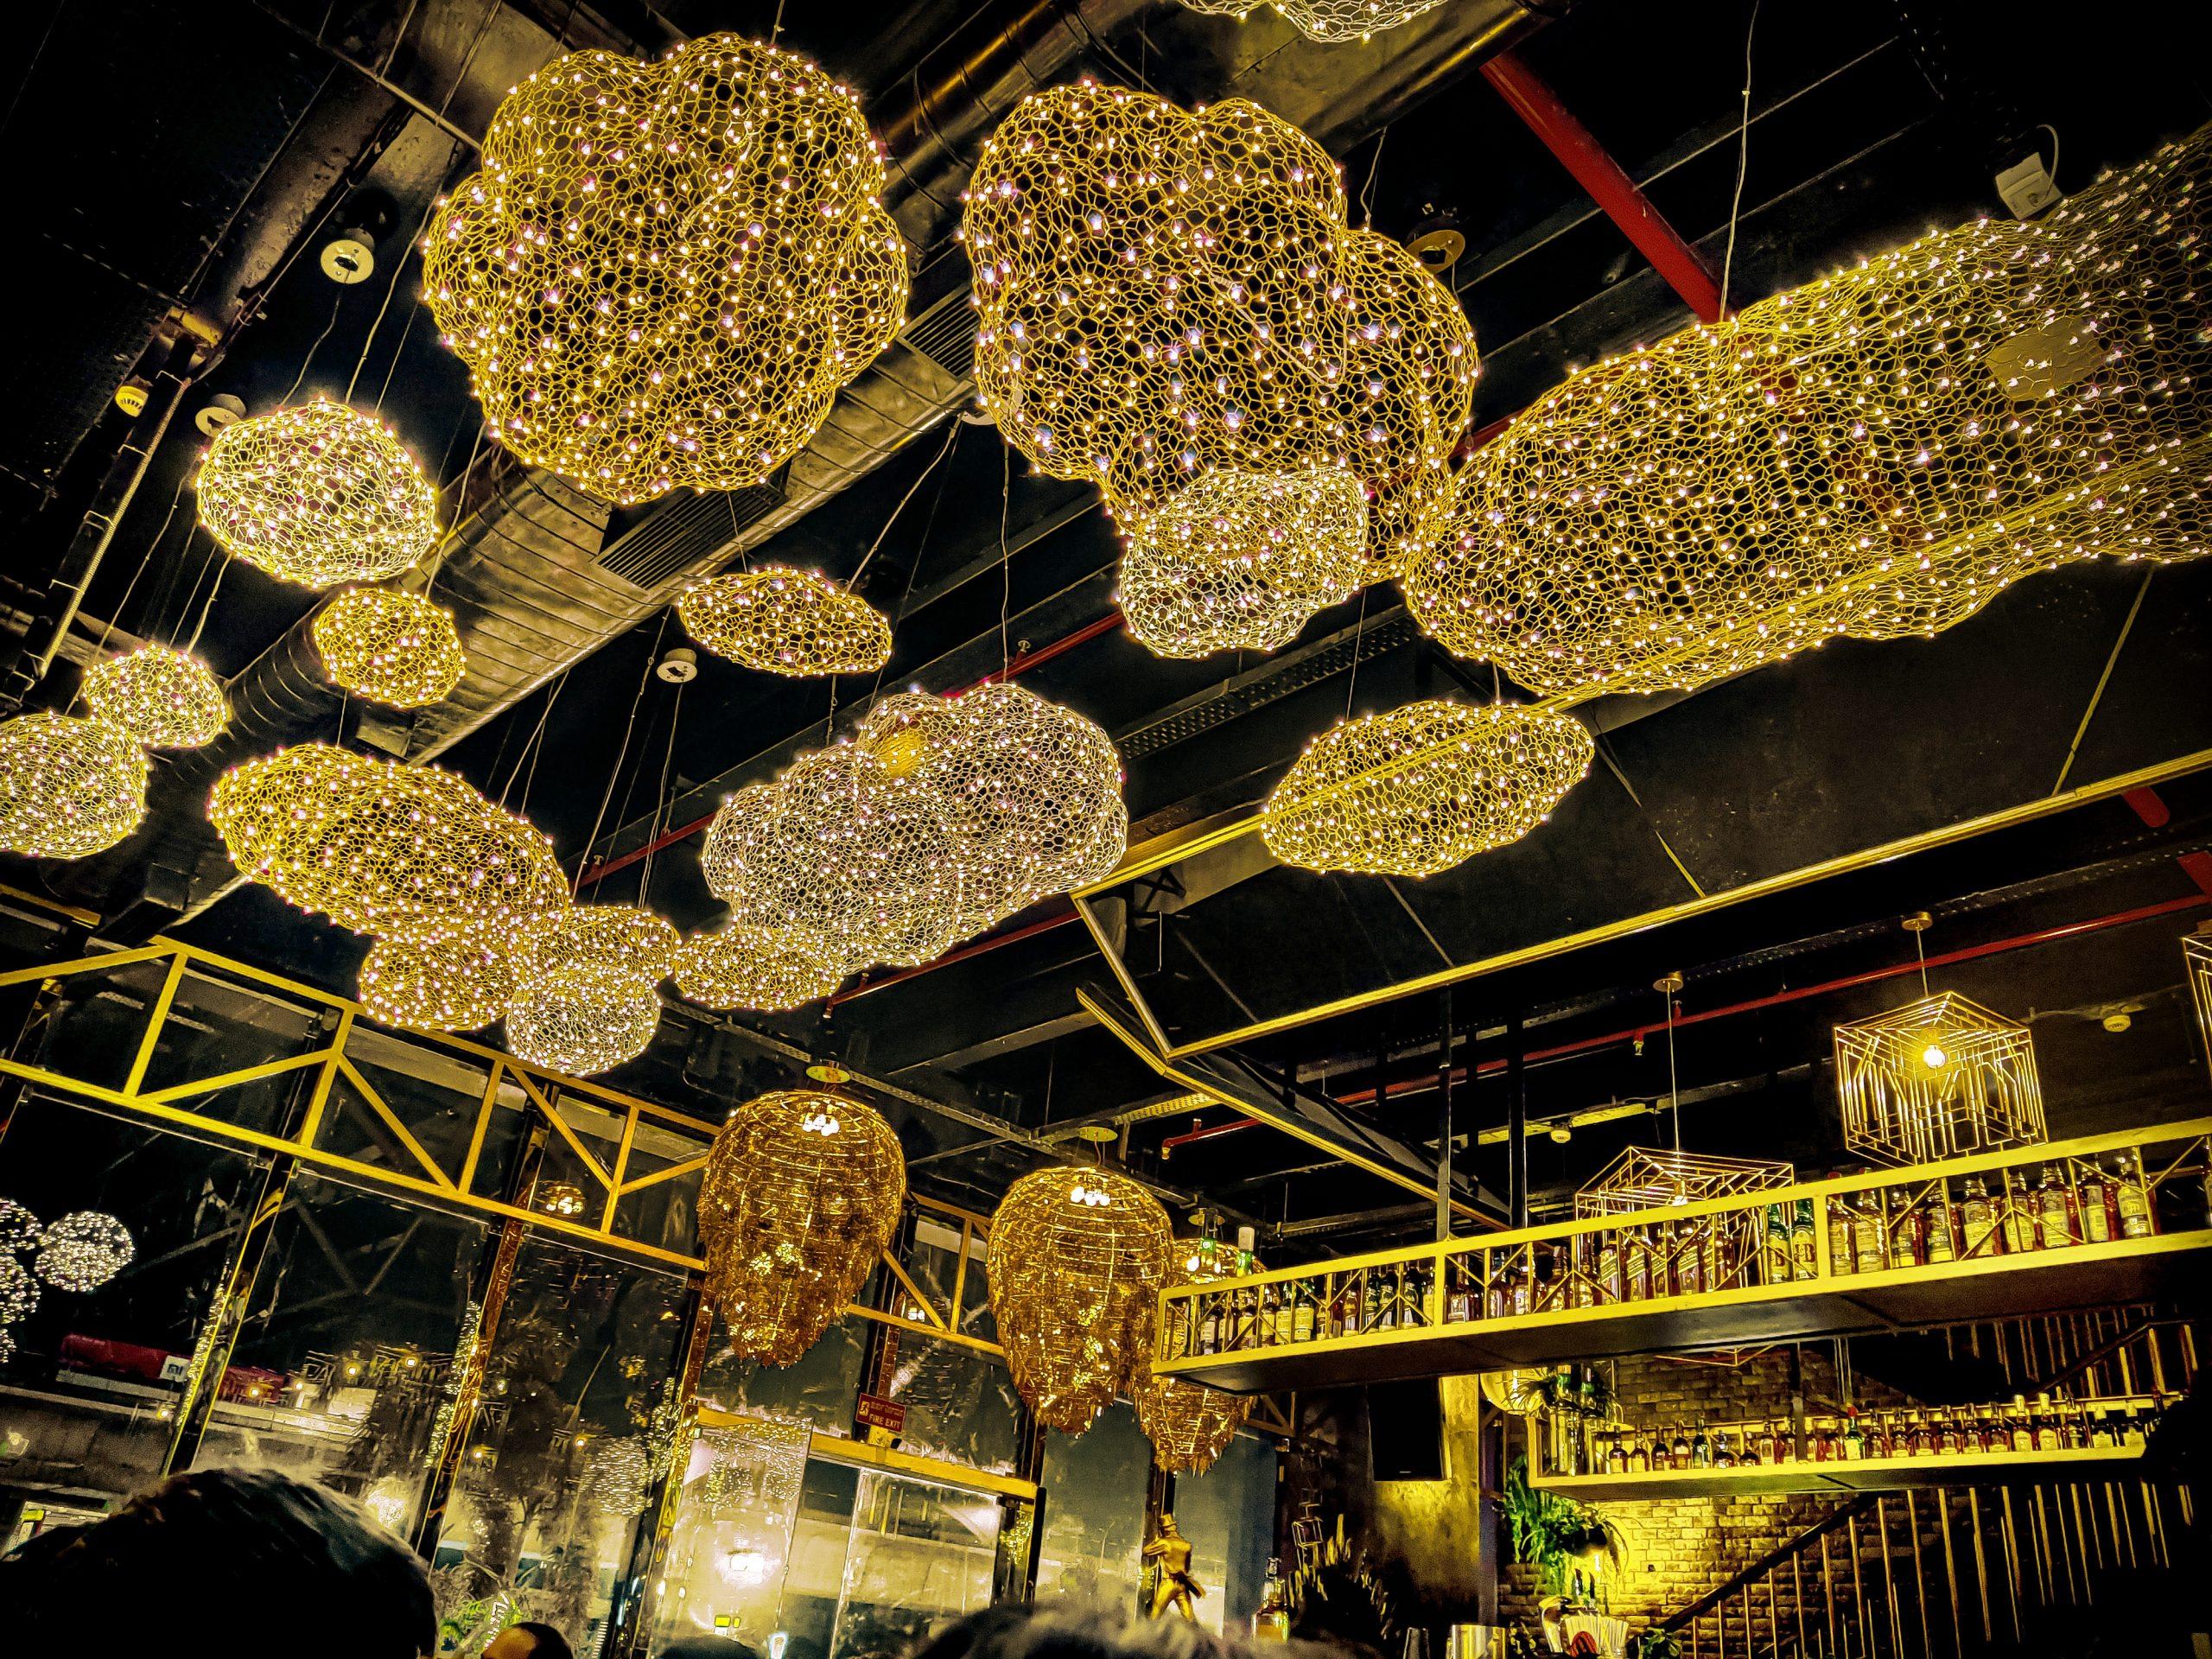 Chandelier in Restaurant